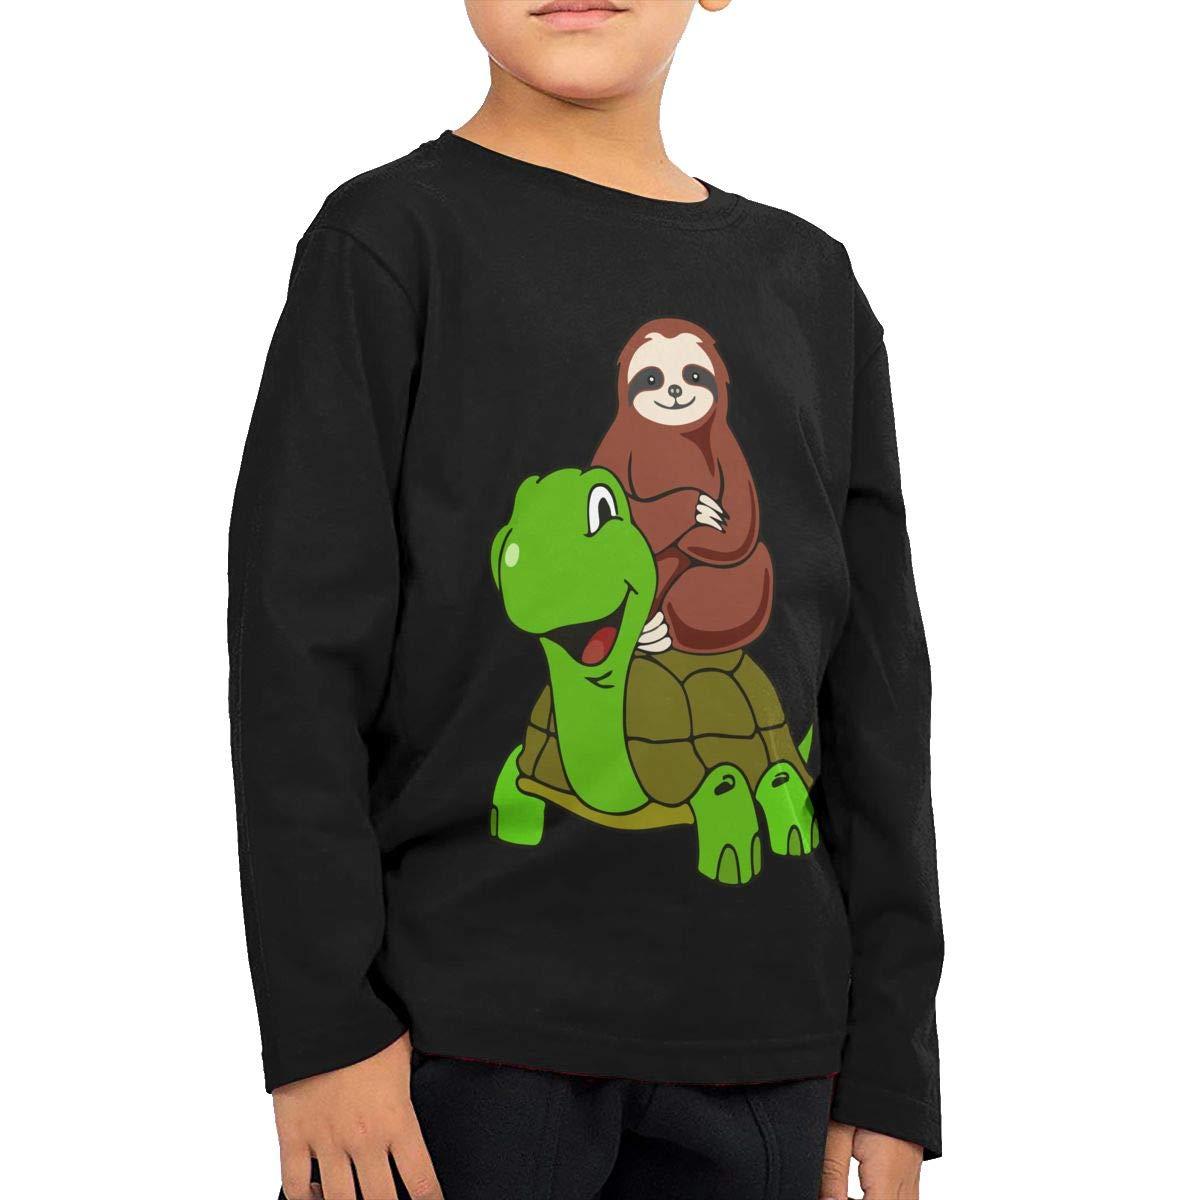 Sloth Riding Tortoise Novelty Toddler Kid Baby Boys Girls Long Sleeve T Shirts Clothing